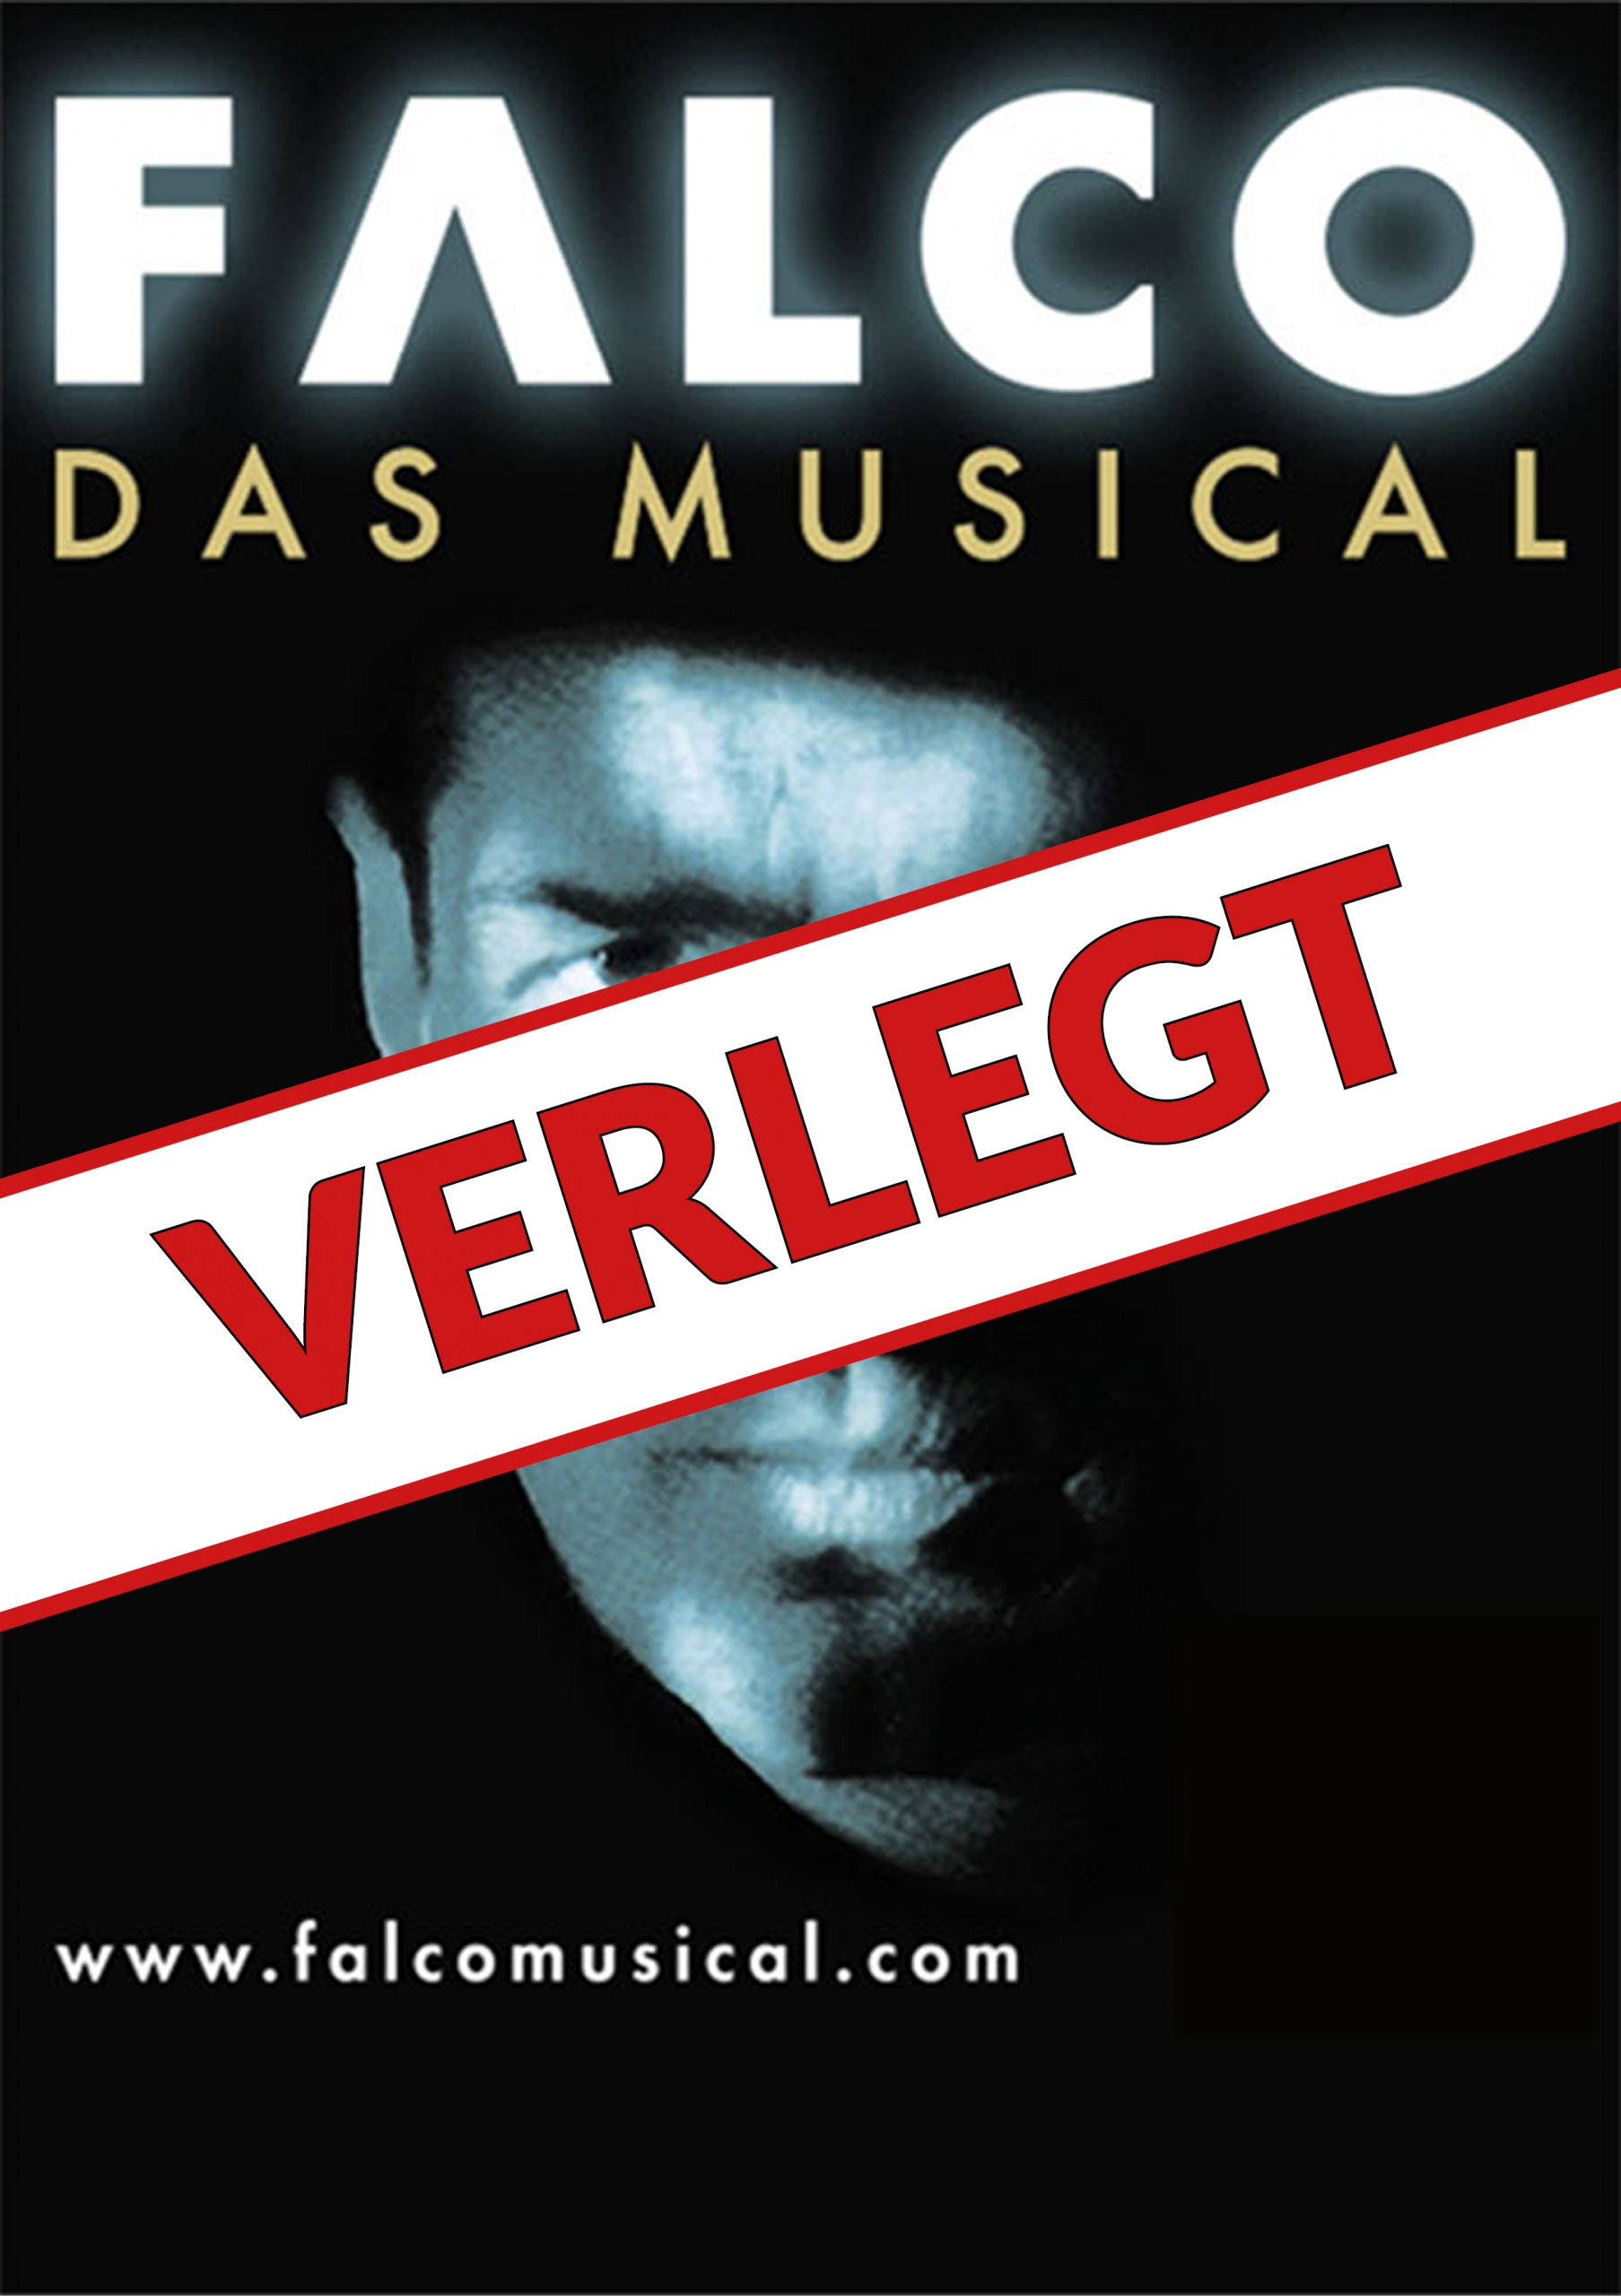 Falco – Das Musical – VERLEGT